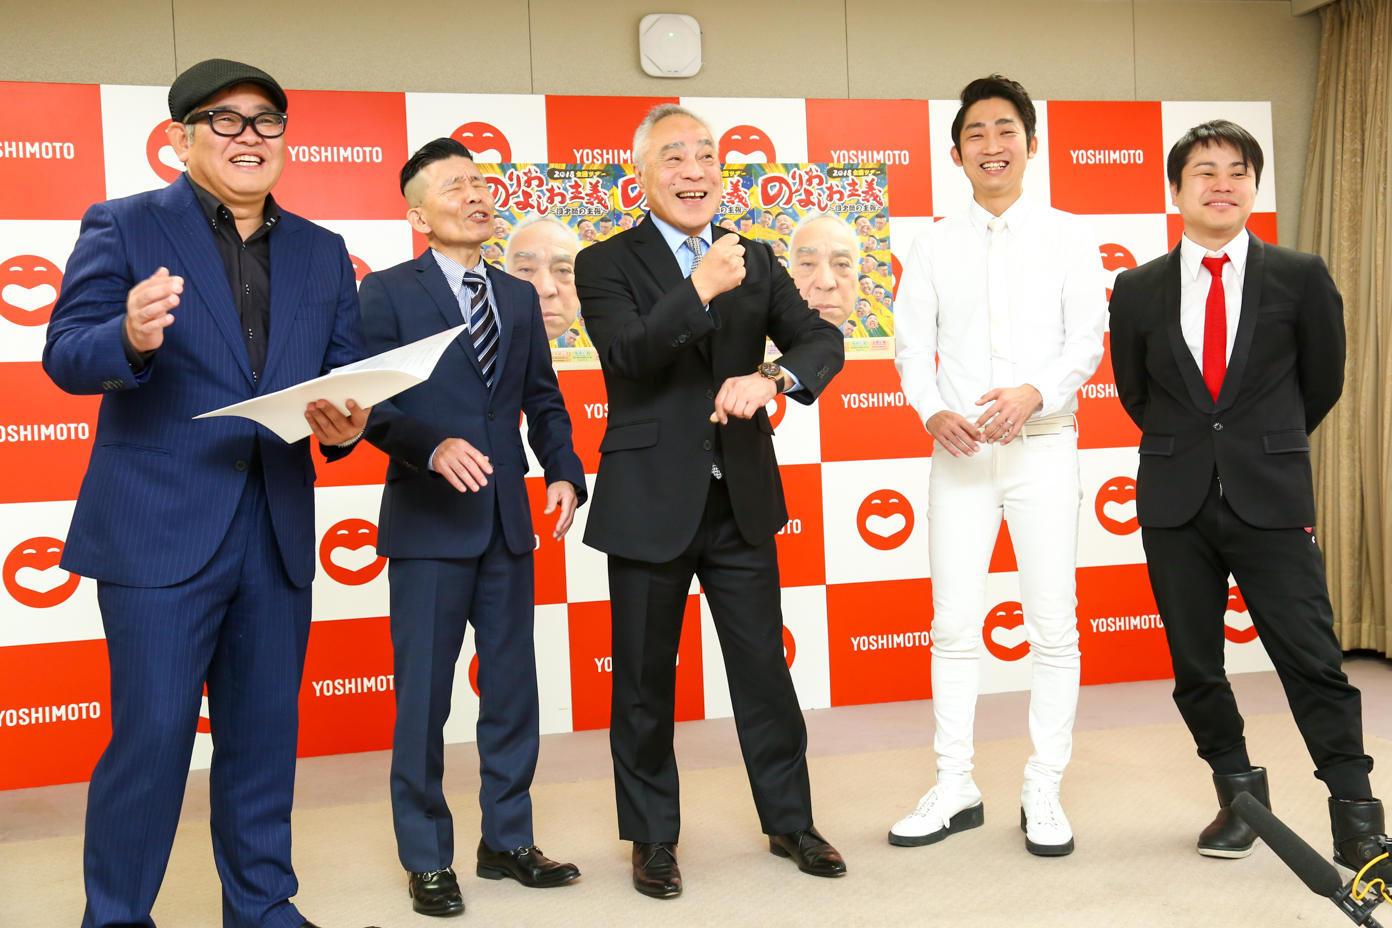 http://news.yoshimoto.co.jp/20171121230820-a9172aa29cec60360e0075bcb692a5297cfdd20d.jpg